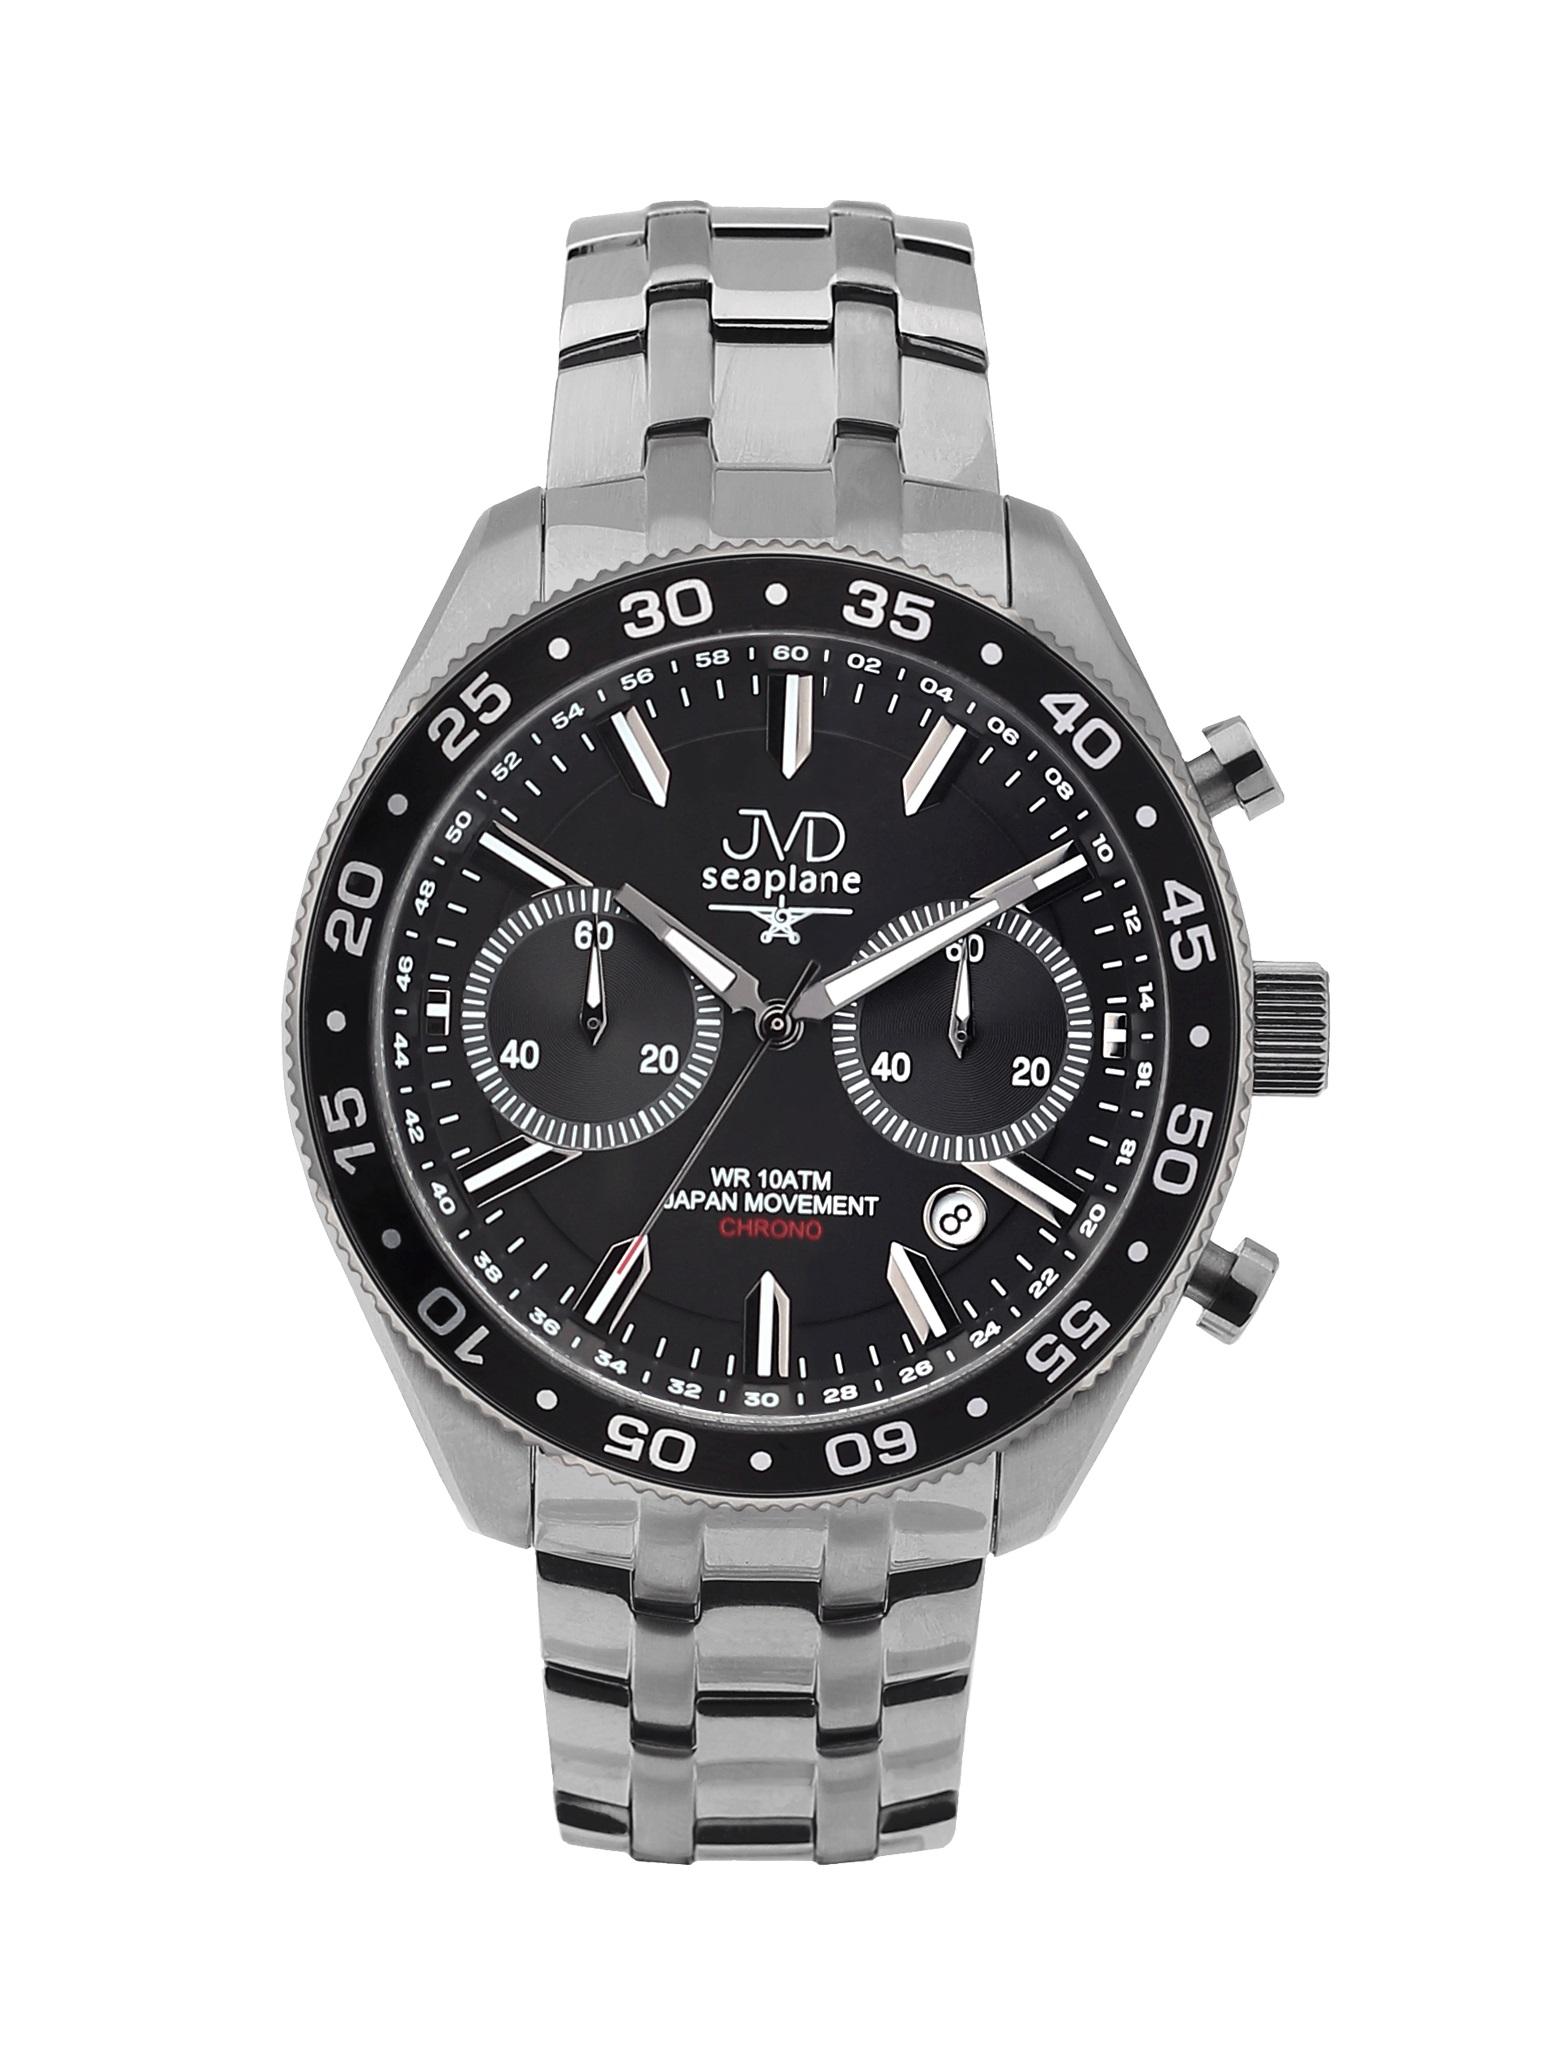 Pánské vodotěsné odolné náramkové hodinky Seaplane INFUSION J1117.2 7e72f7797cf